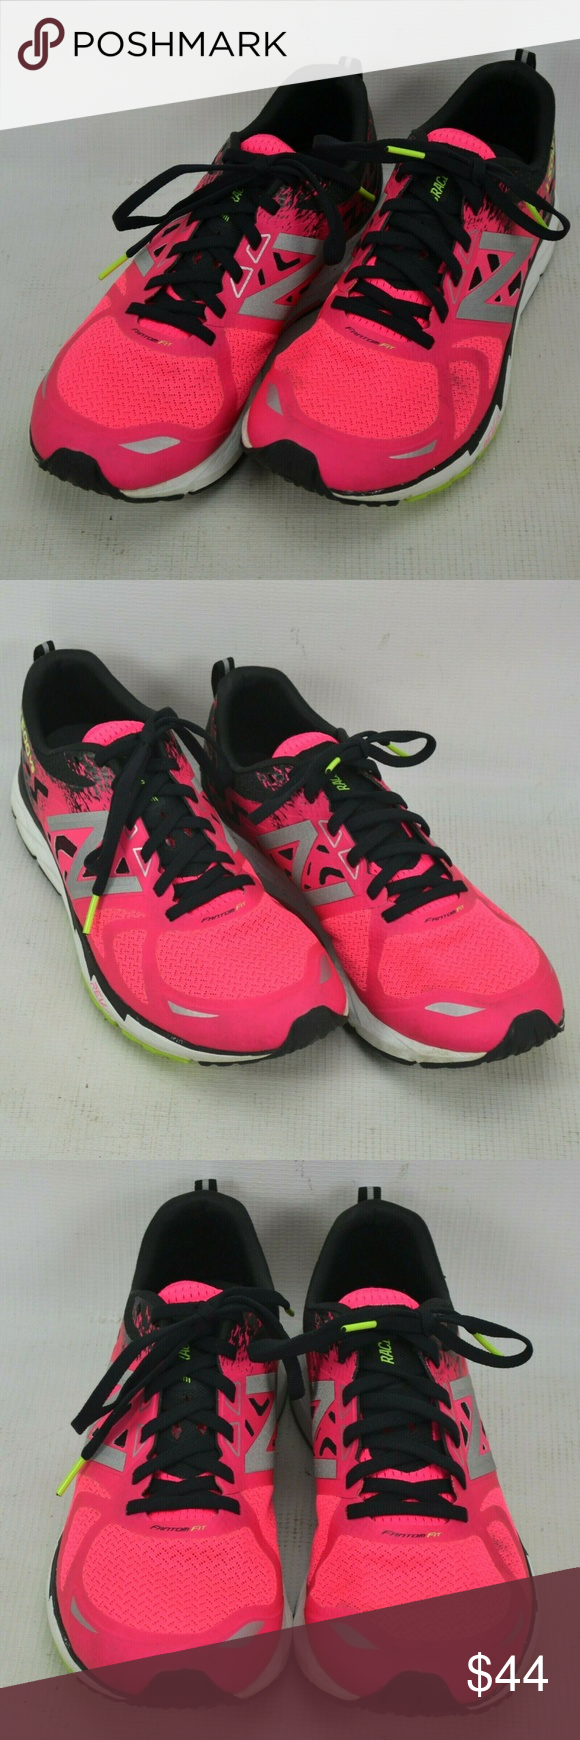 New Balance 1500 v3 Rev Lite Running Shoes Wmns 10 | Running shoes ...